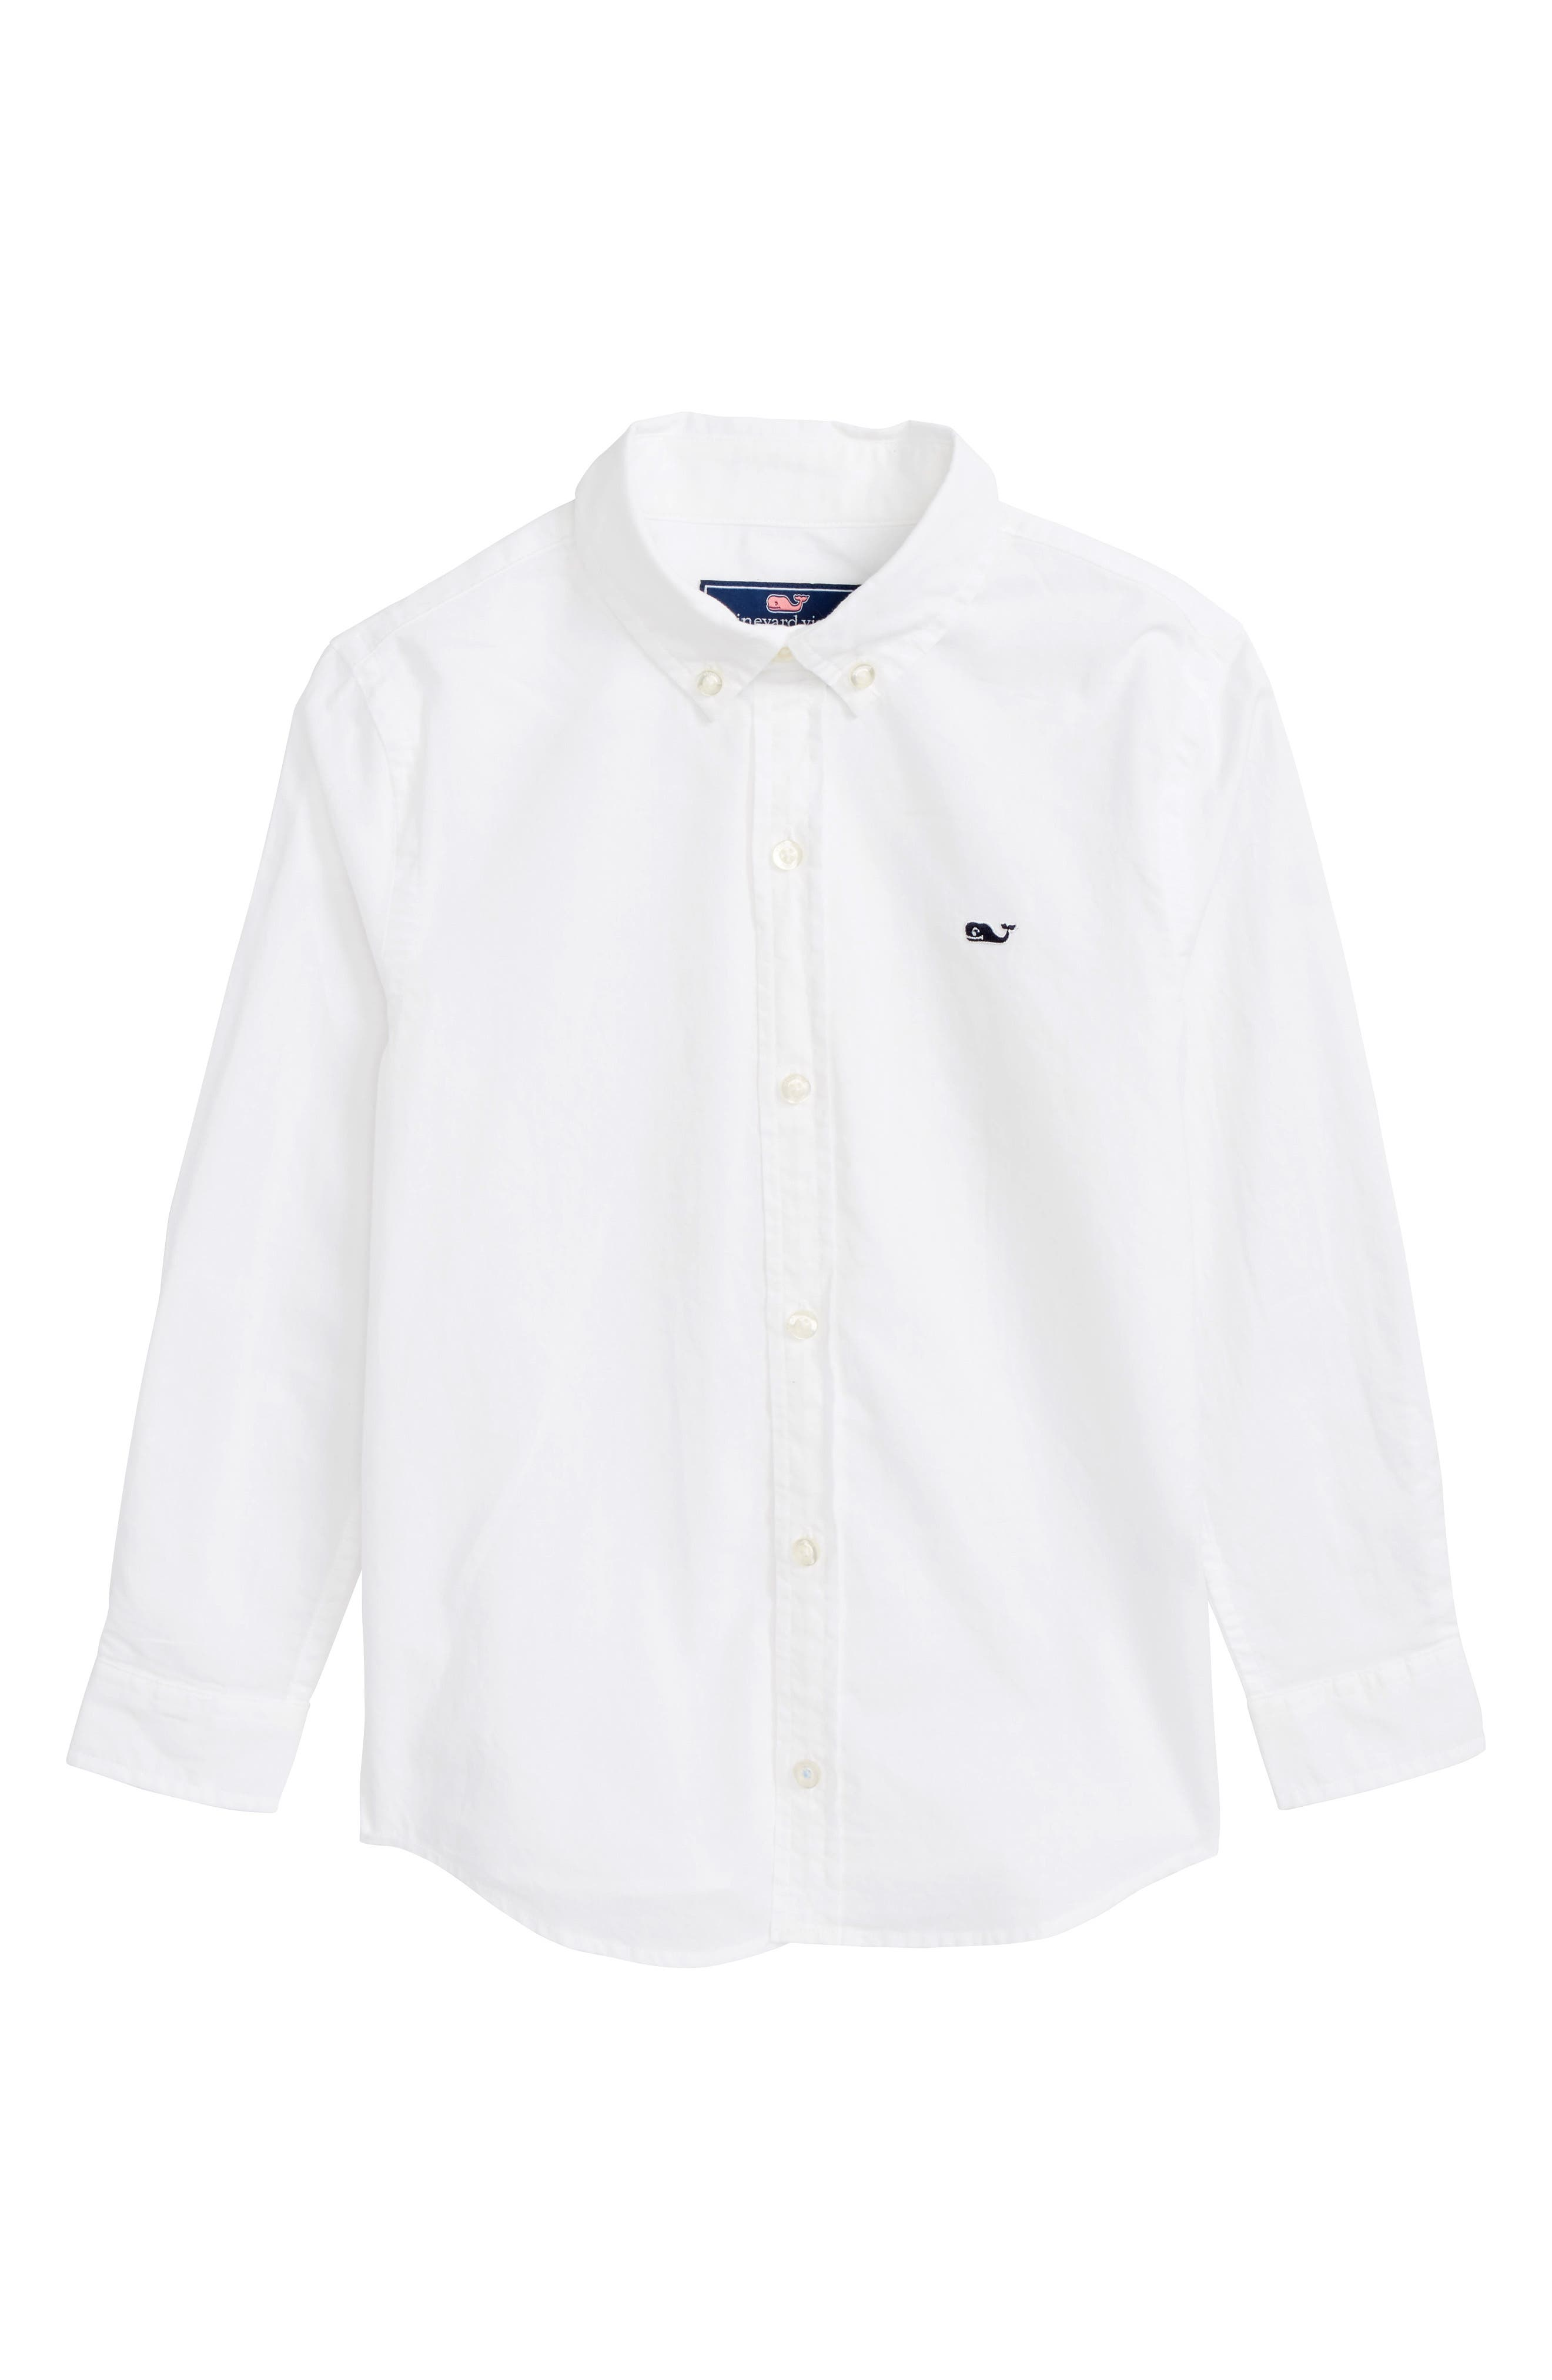 Whale Woven Shirt,                             Main thumbnail 1, color,                             100